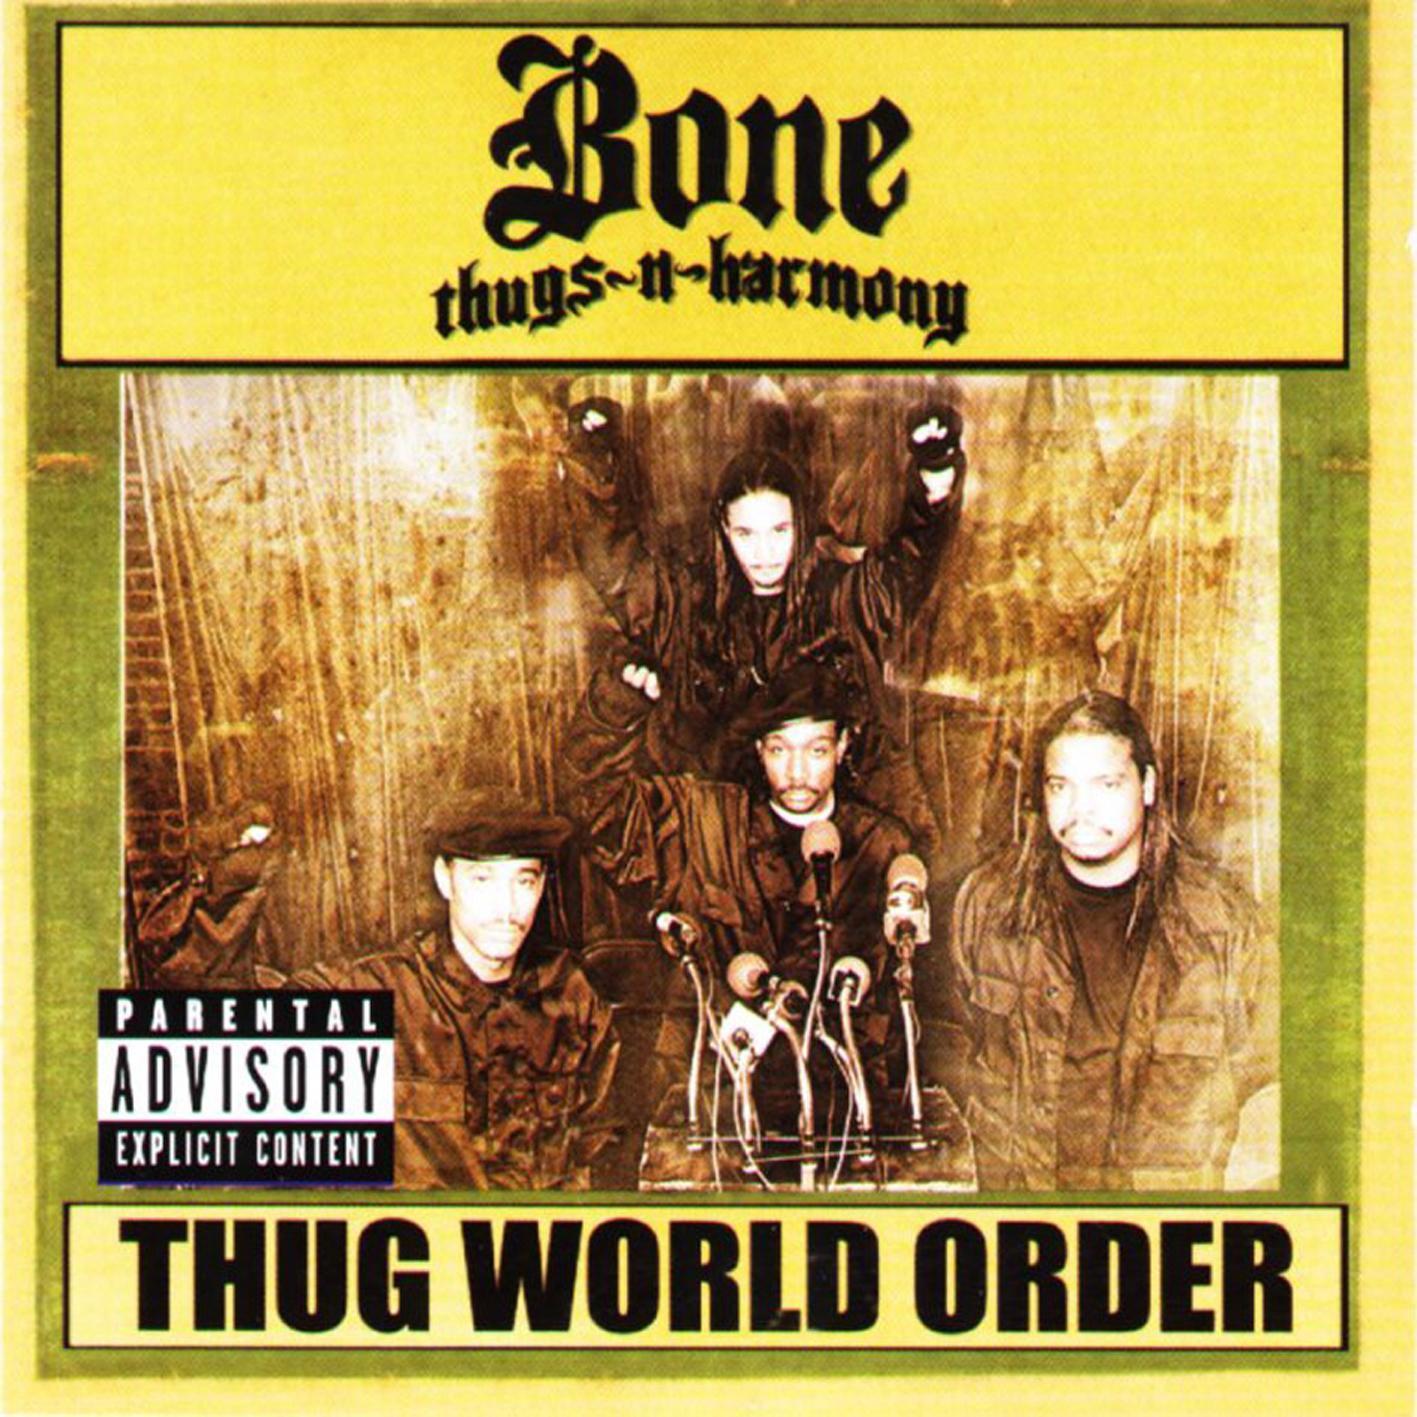 bone thugs n harmony greatest hits download sharebeast